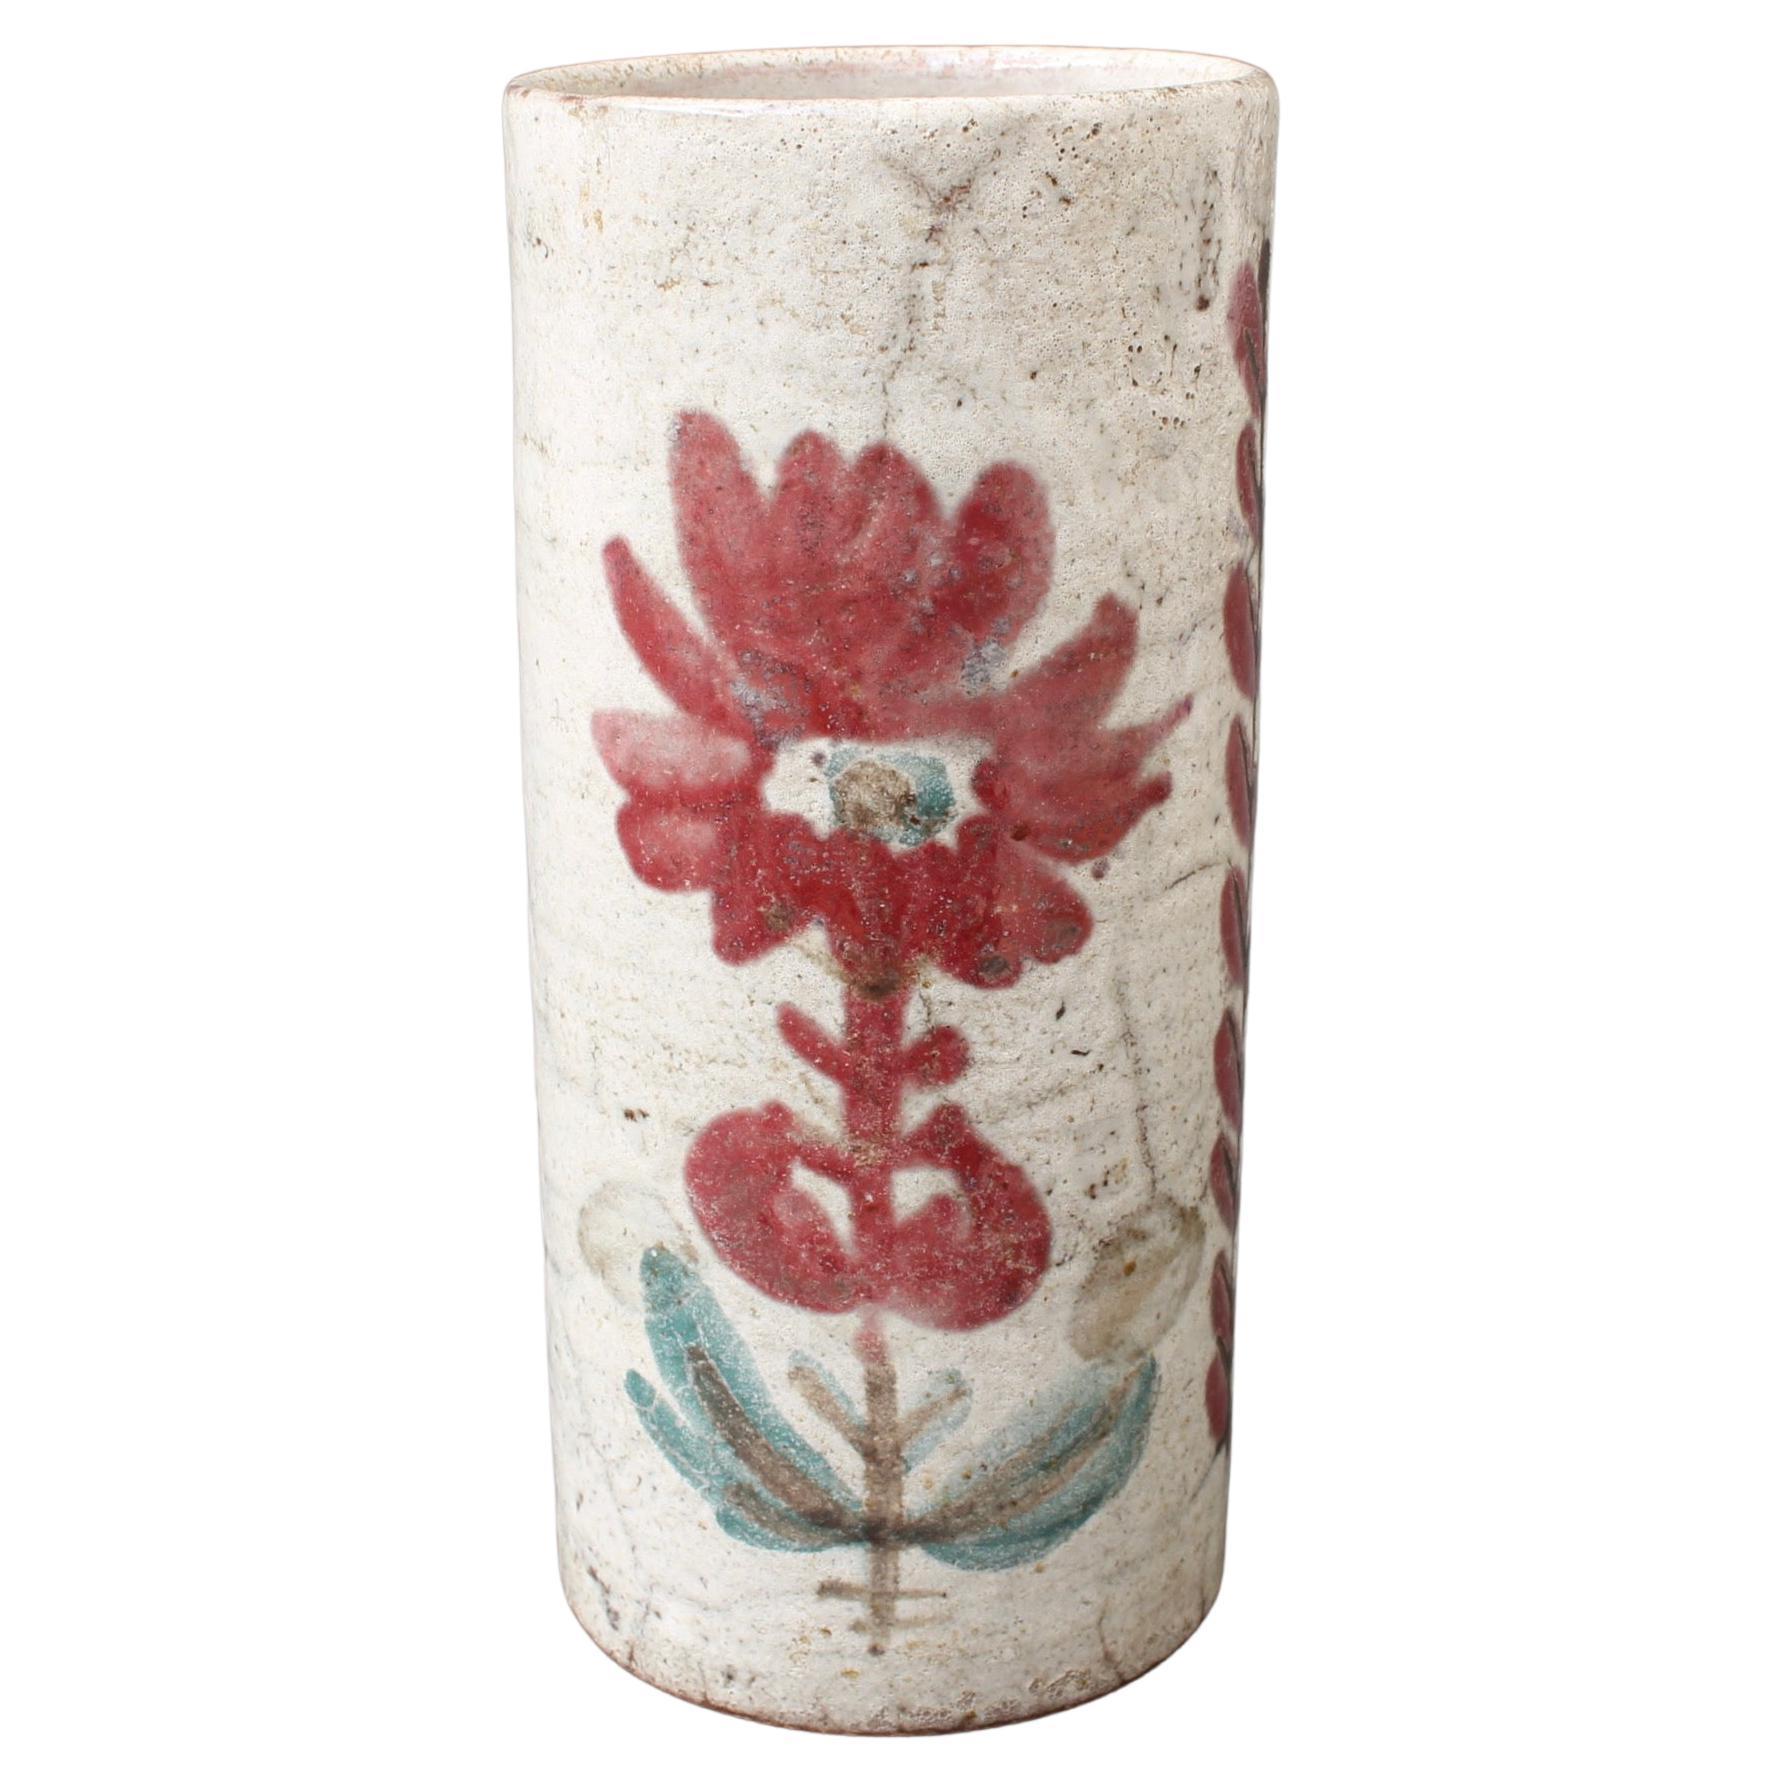 Vintage French Ceramic Flower Vase by Le Mûrier 'circa 1960s'